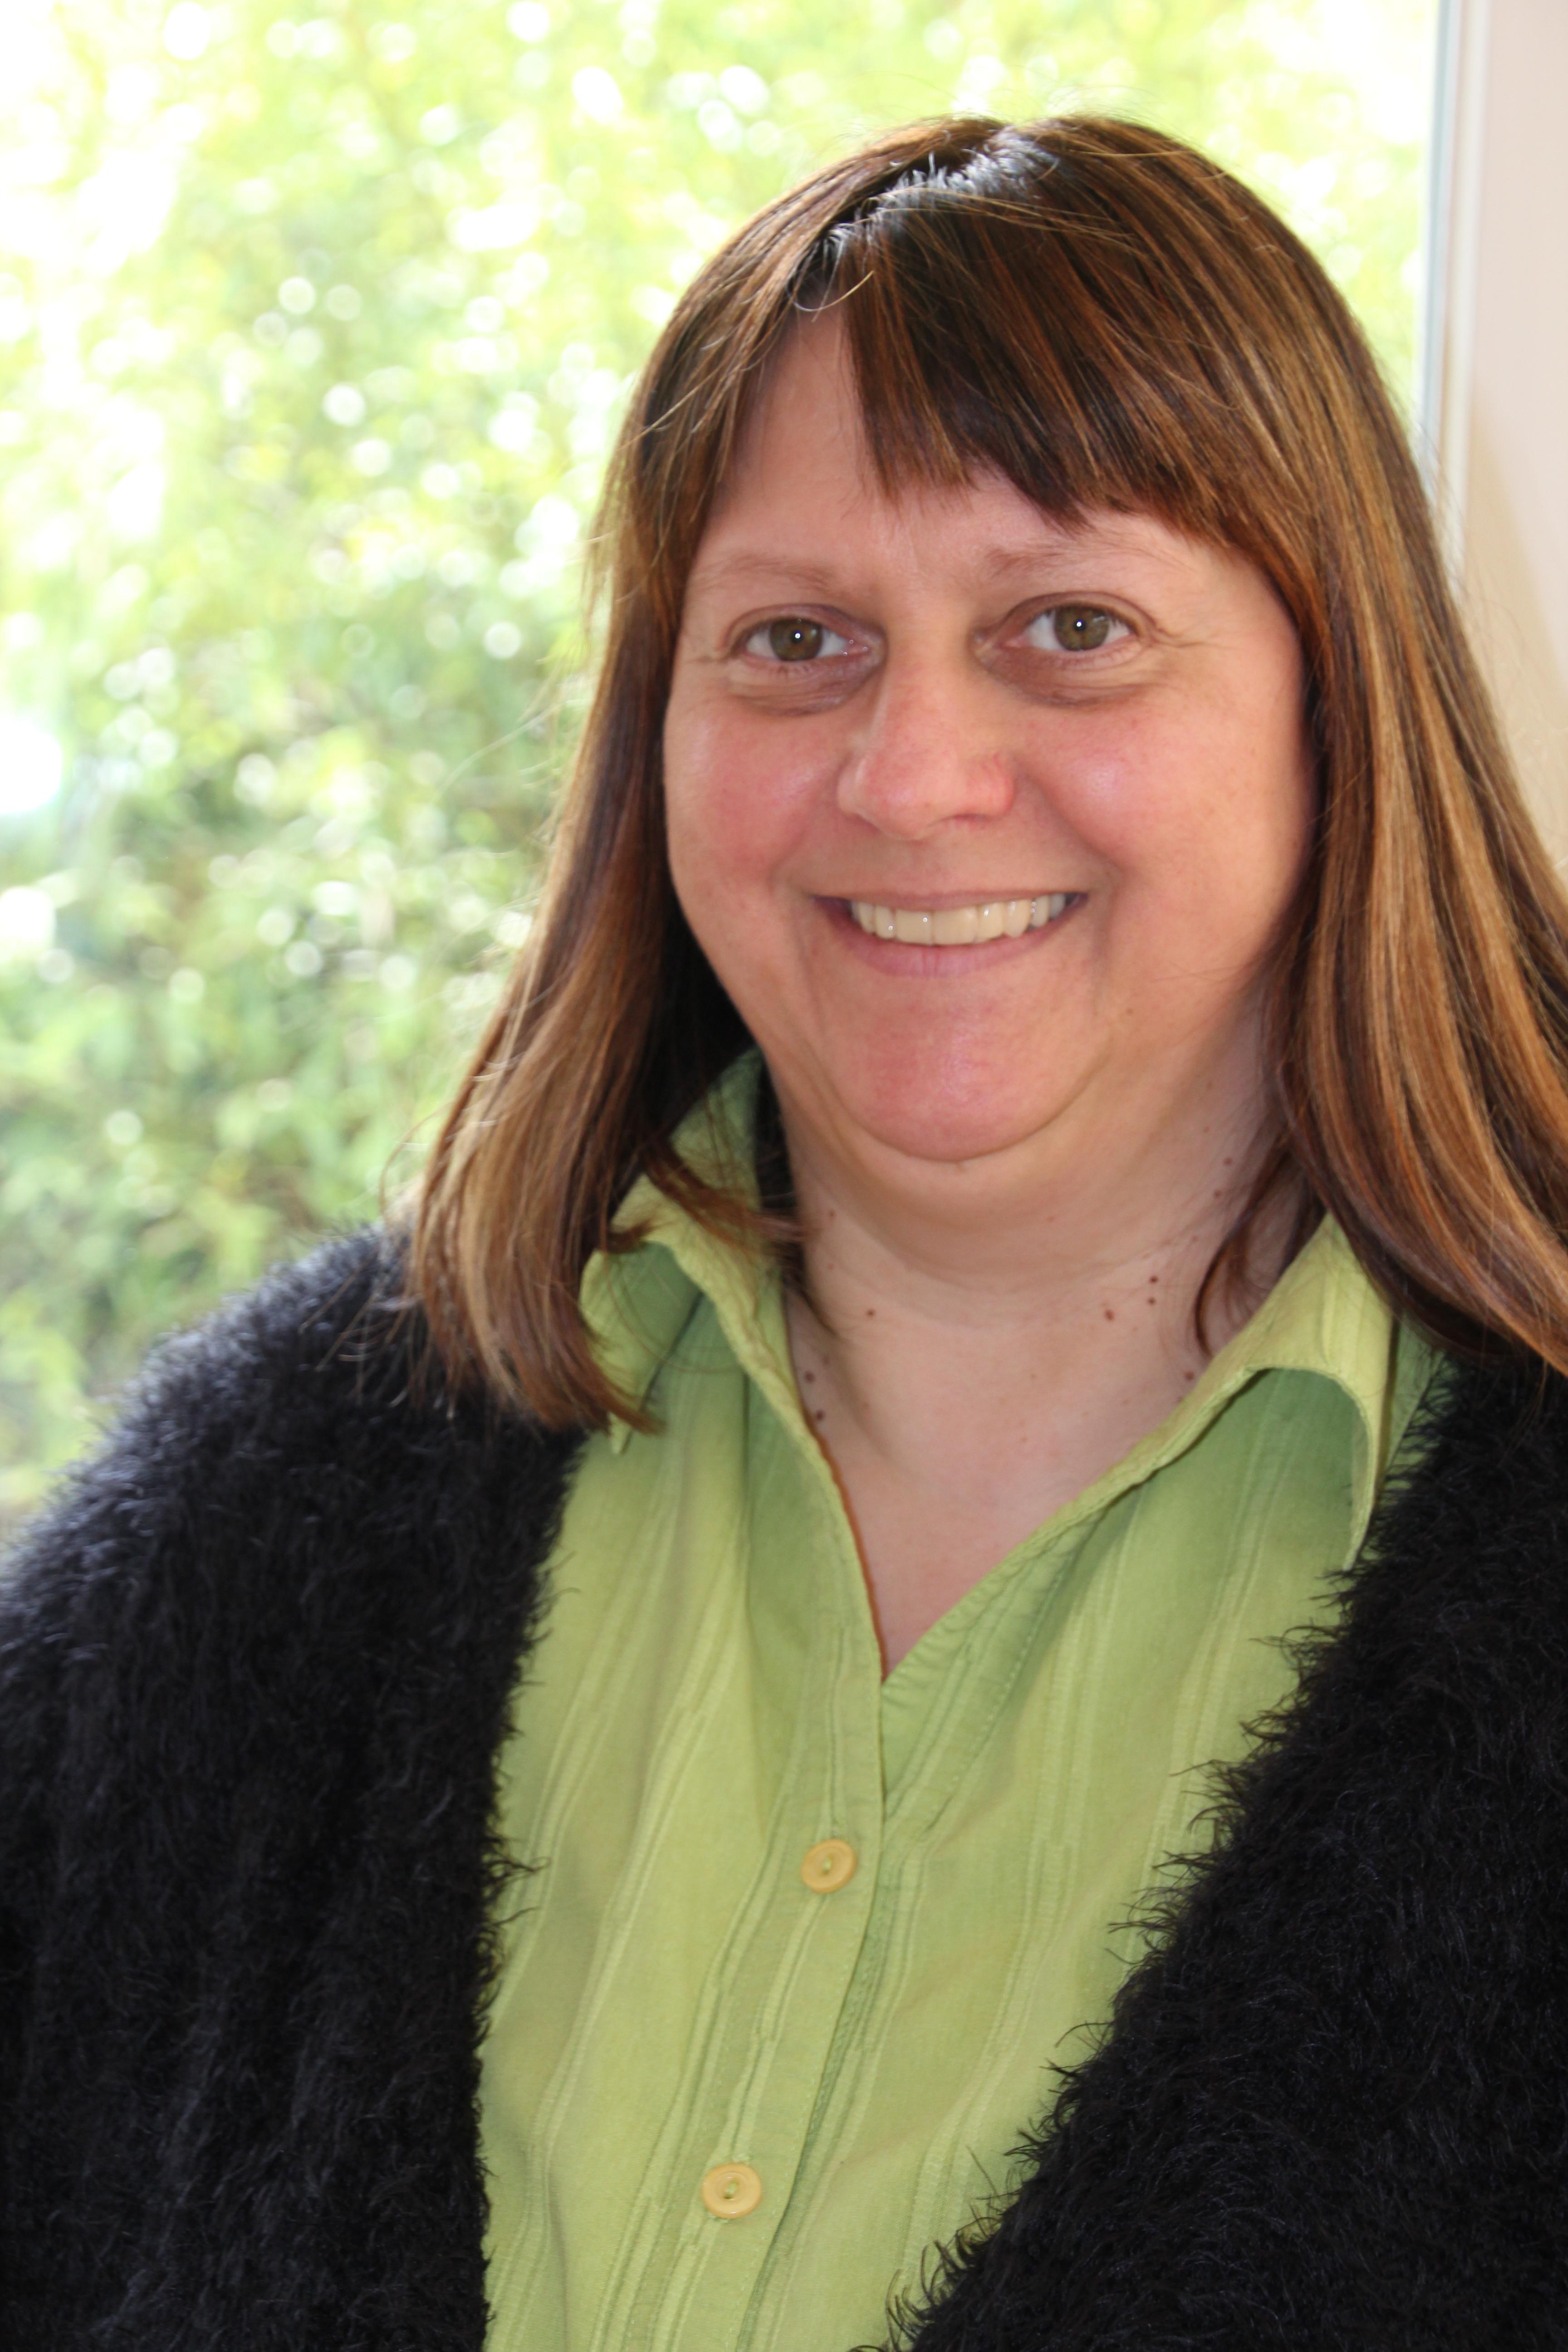 Porträt Schwester Andrea Kiel